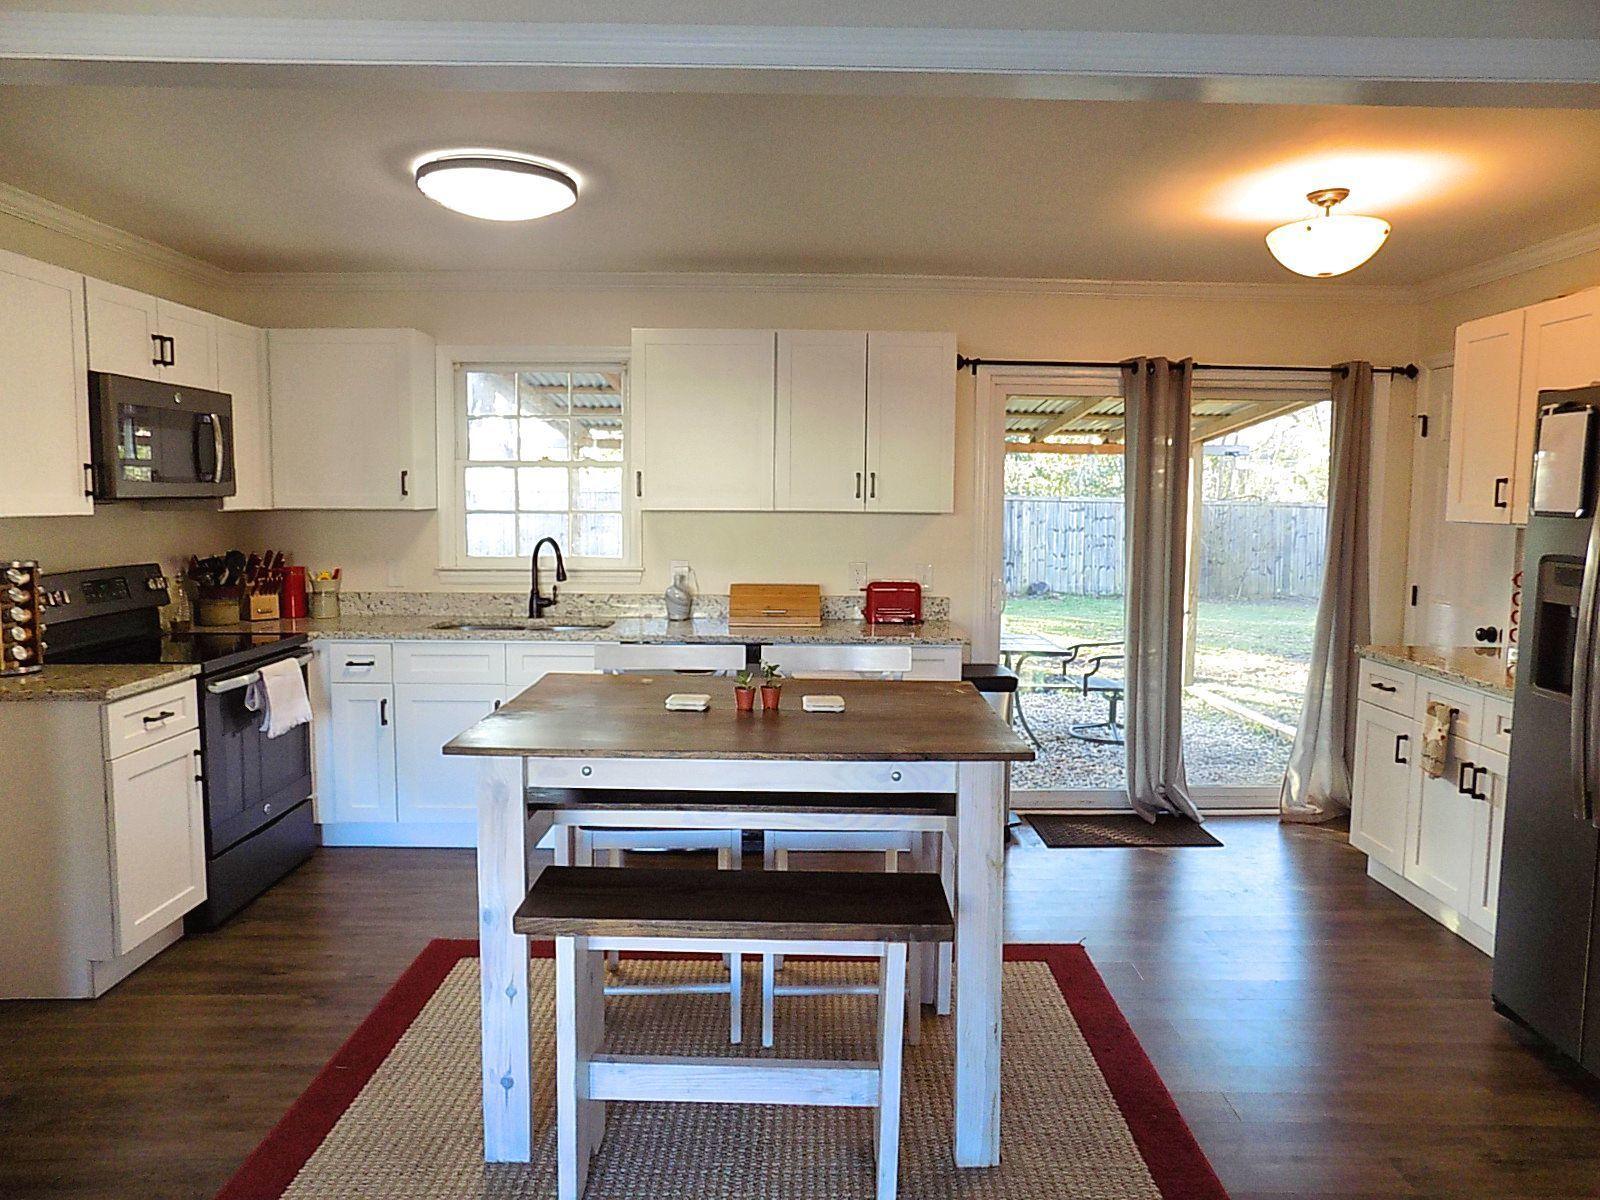 West Ashley Plantation Homes For Sale - 1720 Boone Hall, Charleston, SC - 17